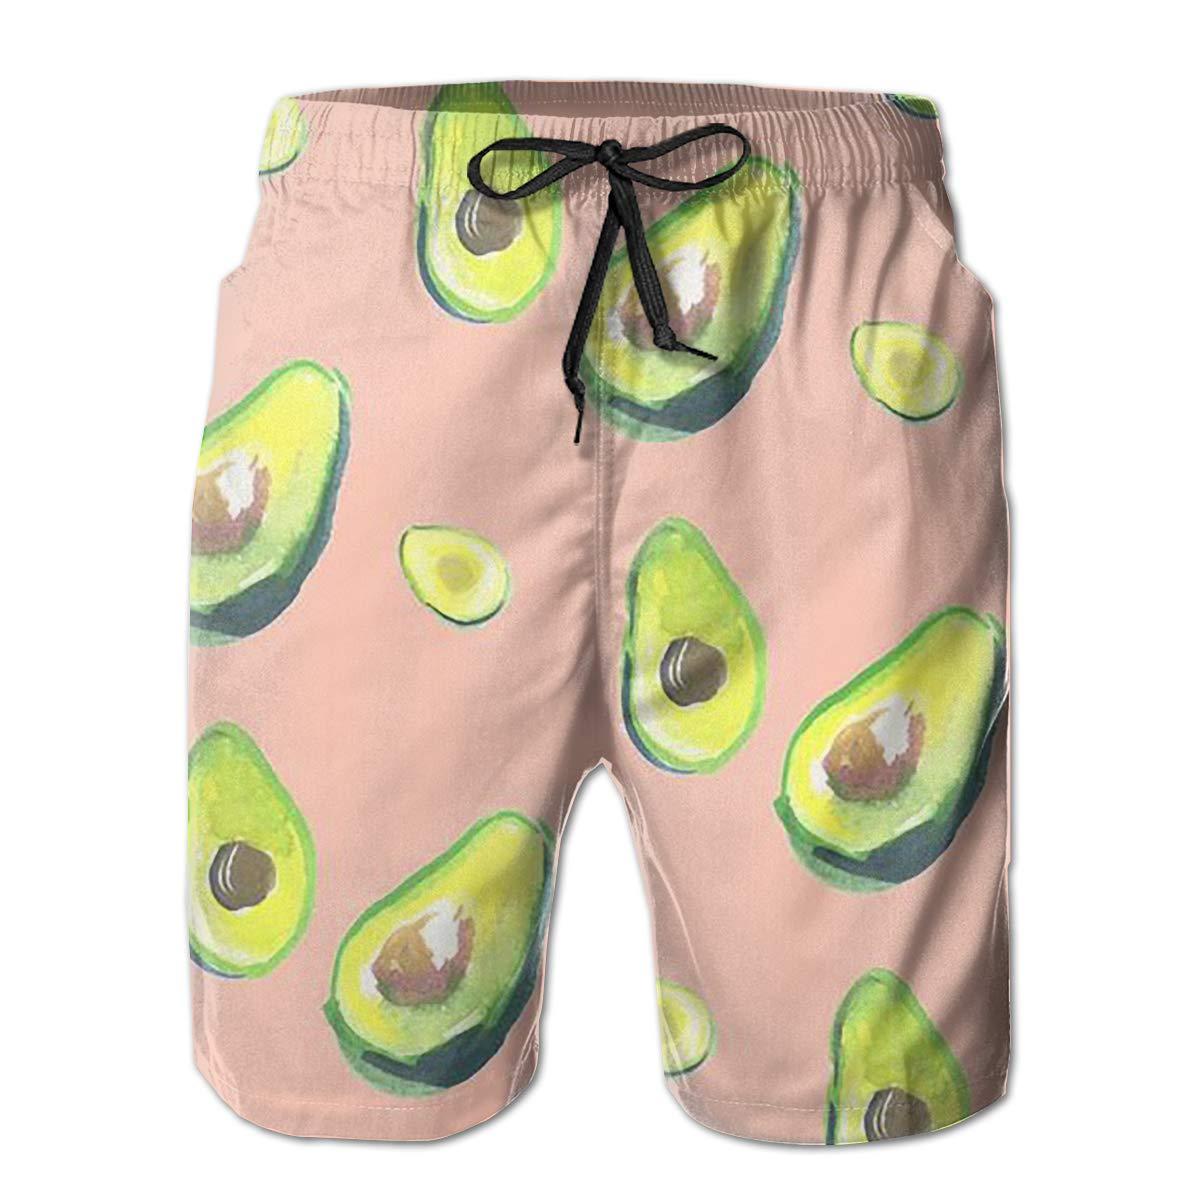 Wexzss Avocado Funny Summer Quick-Drying Swim Trunks Beach Shorts Cargo Shorts